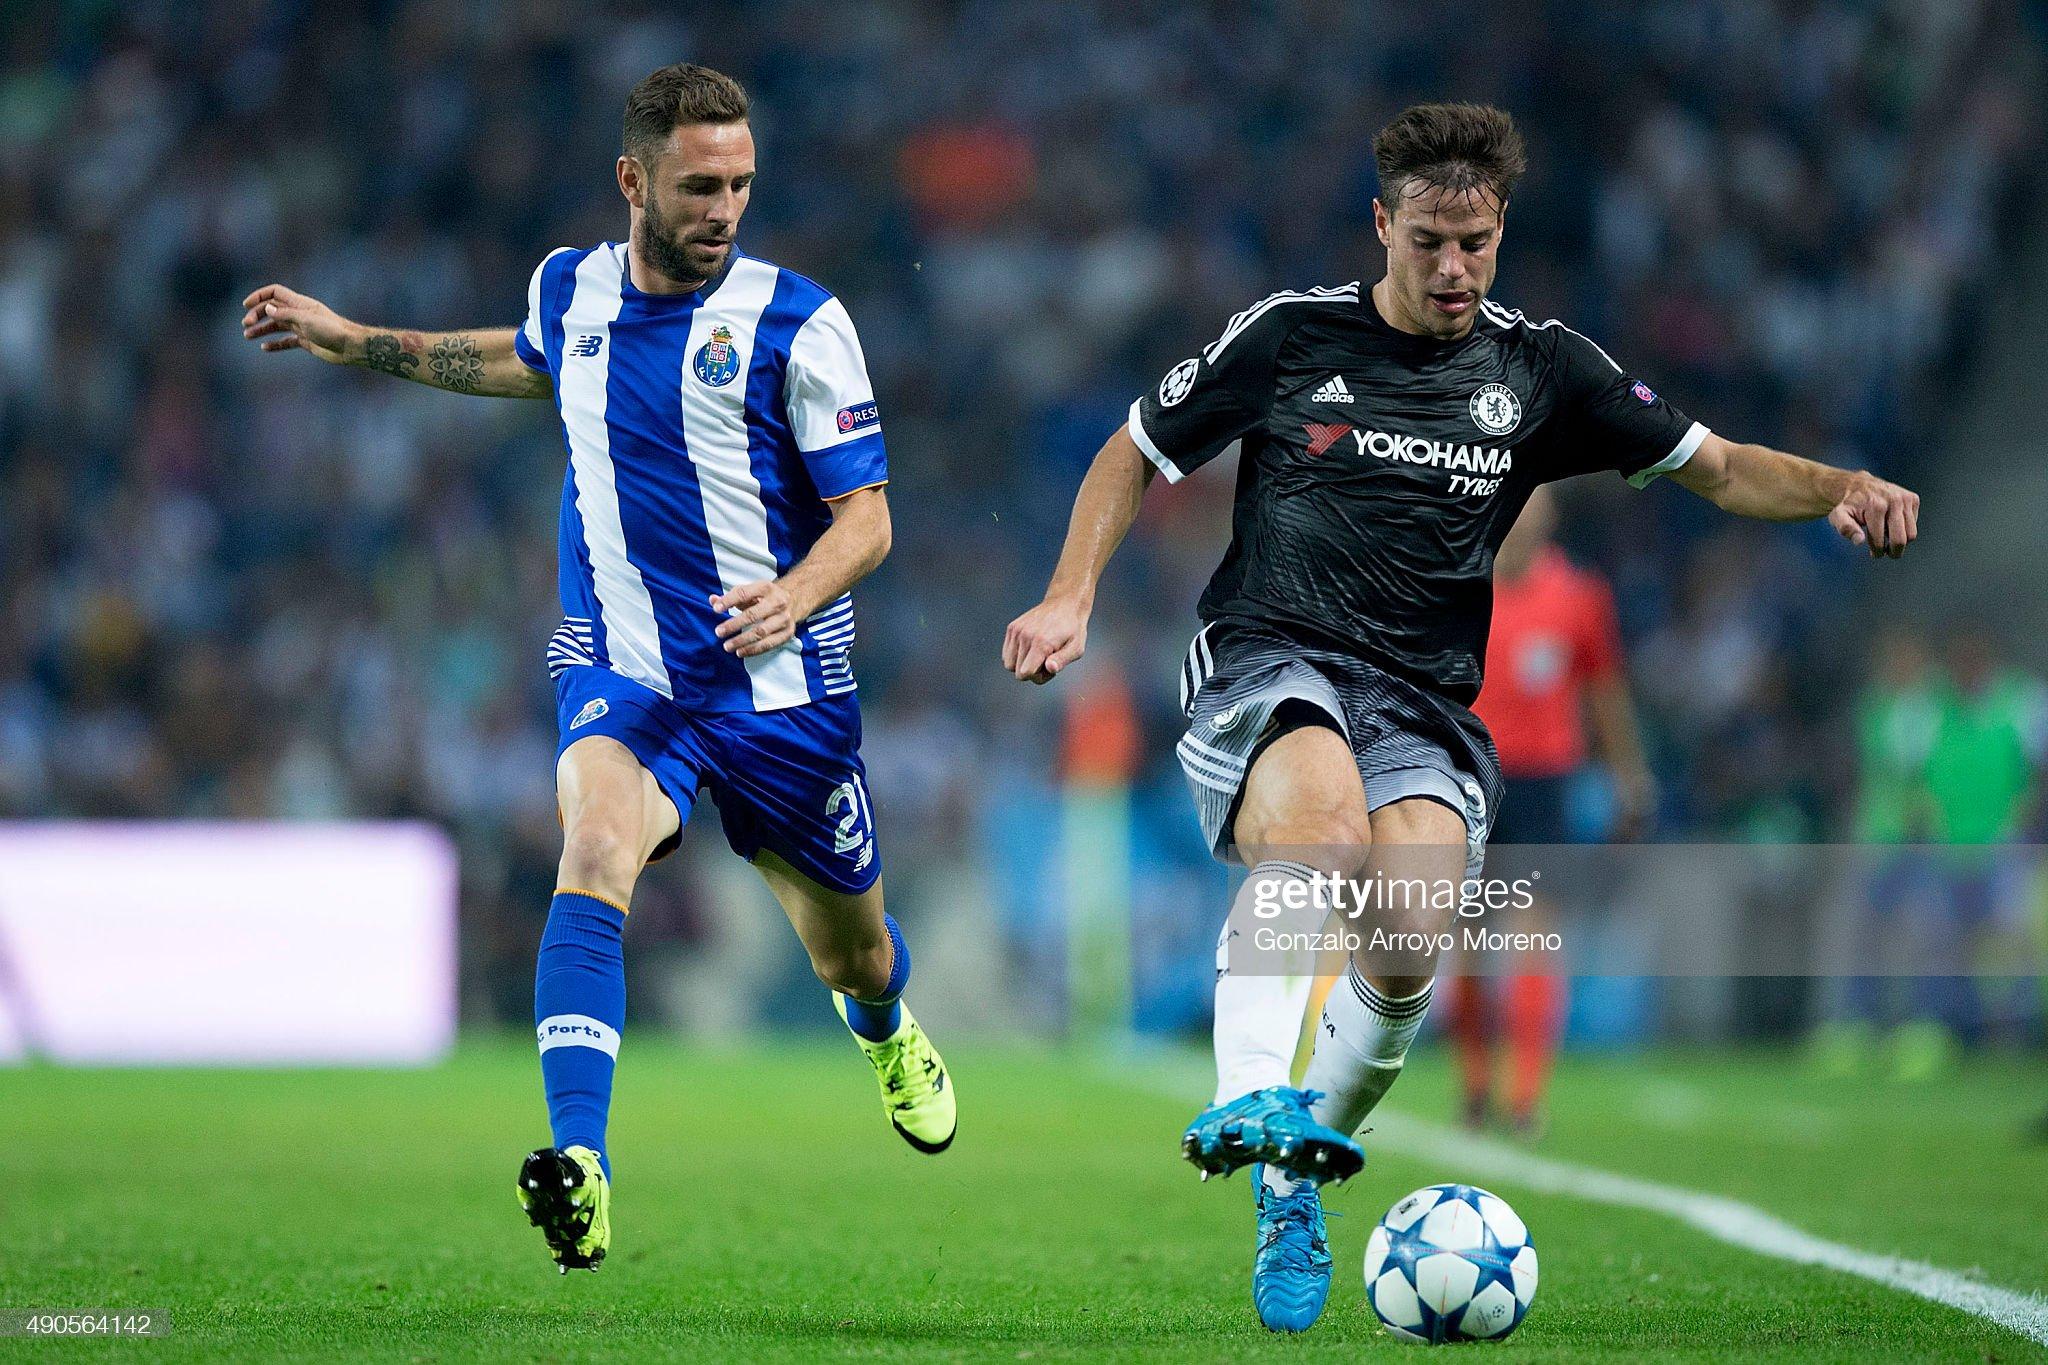 Porto vs Chelsea preview, prediction and odds